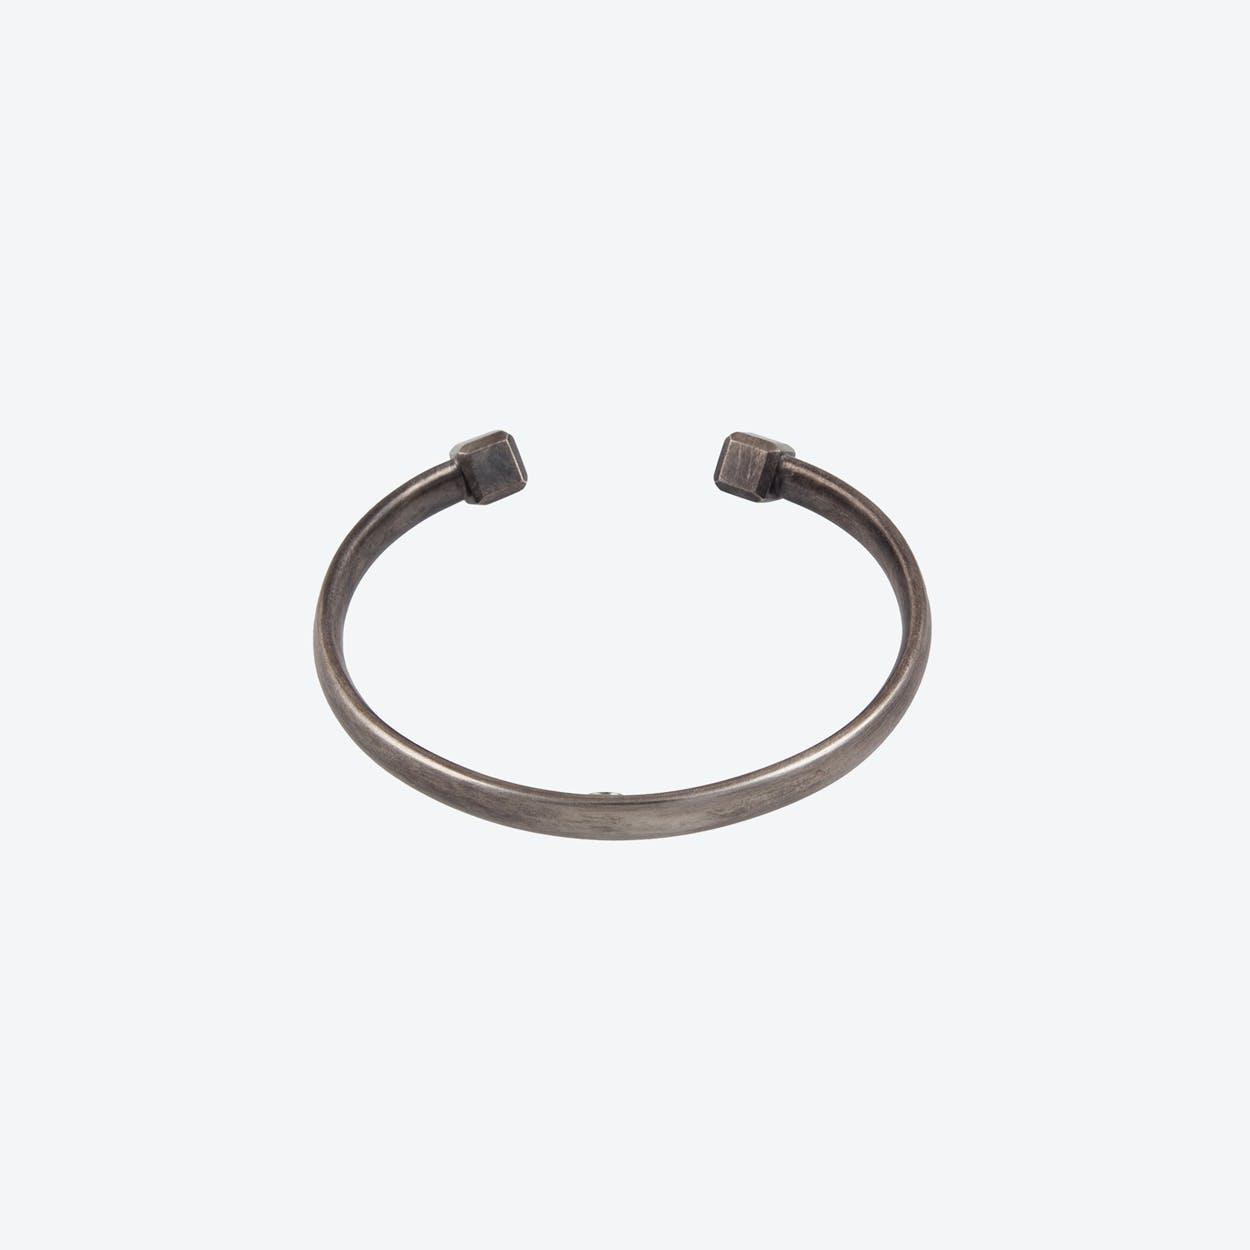 OVAL X Slim Bracelet in Oxidized Sterling Silver